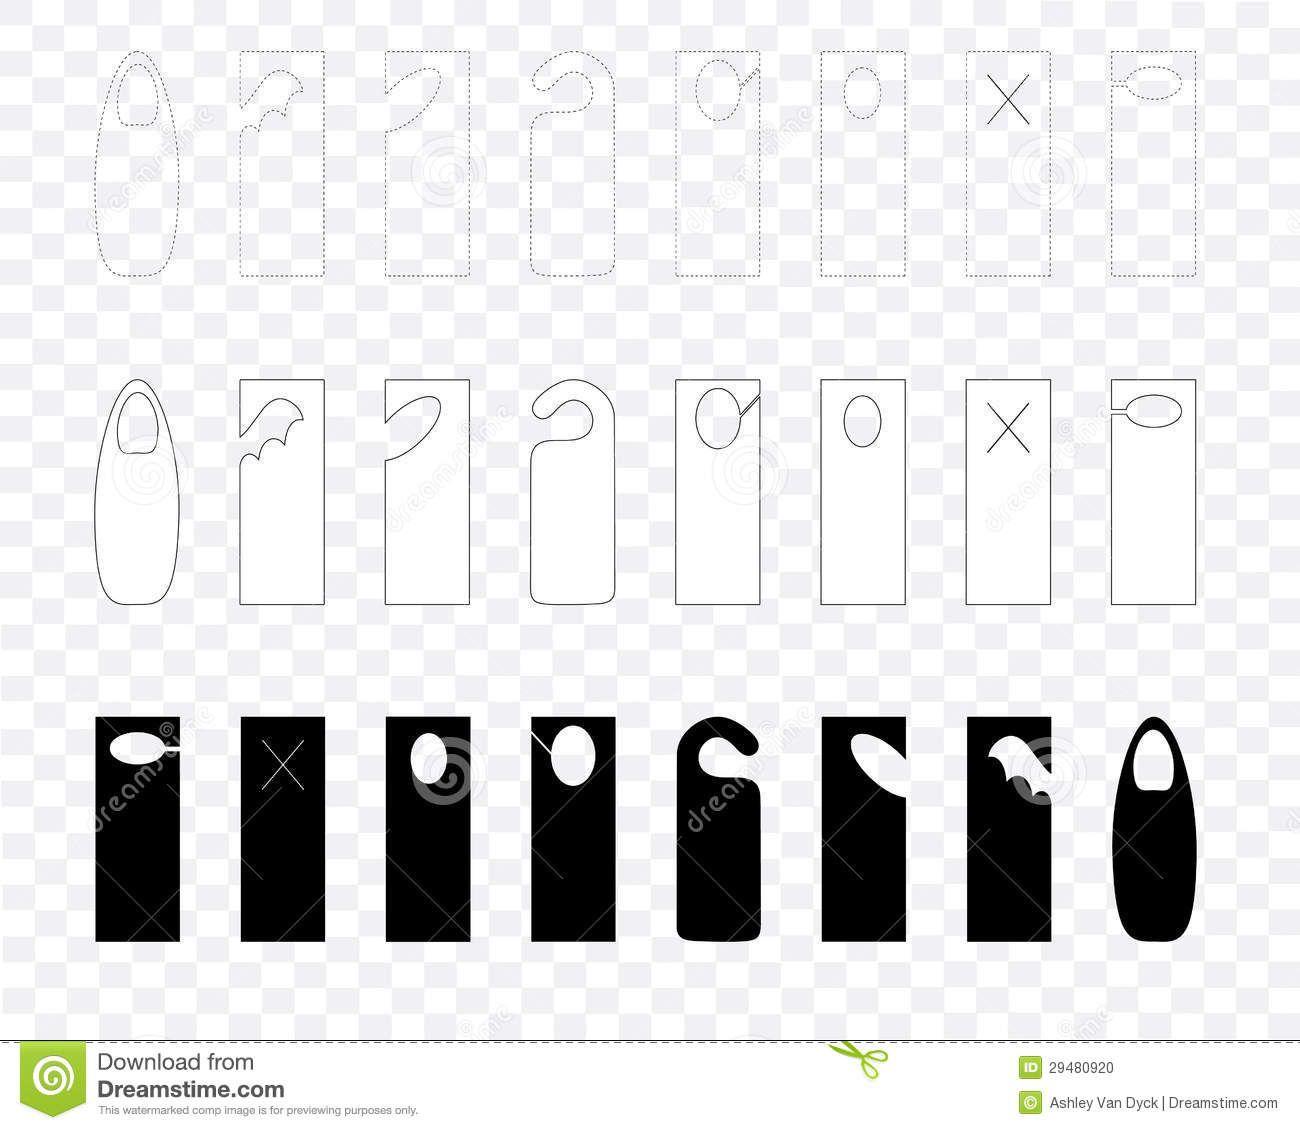 003 Fascinating Blank Door Hanger Template Highest Clarity  Free Printable Microsoft WordFull